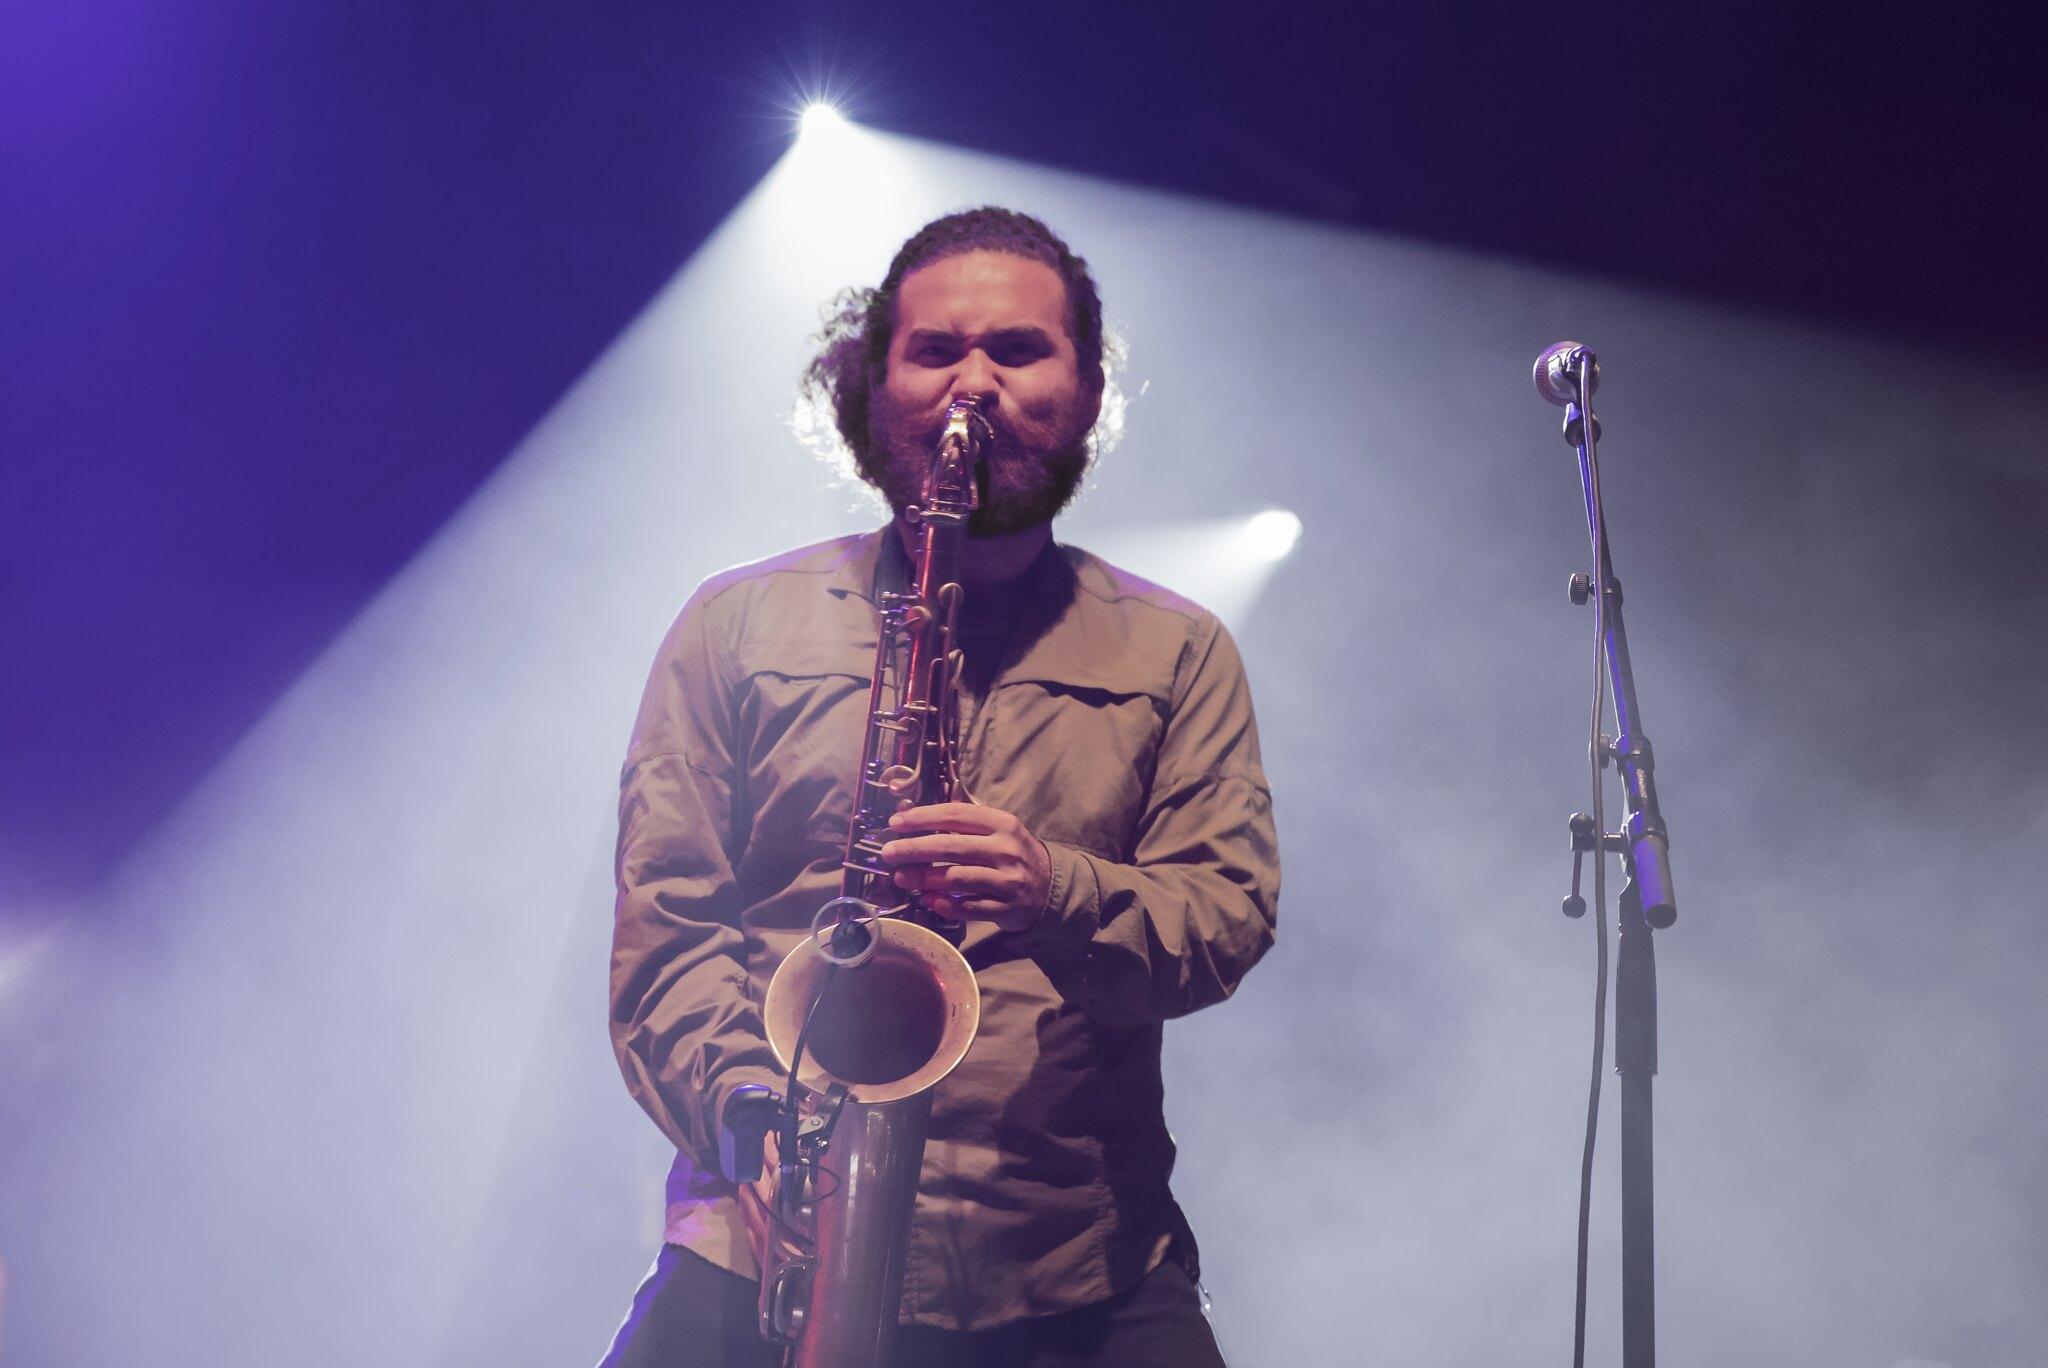 Rebelution saxophonist Eric Hirschhorn